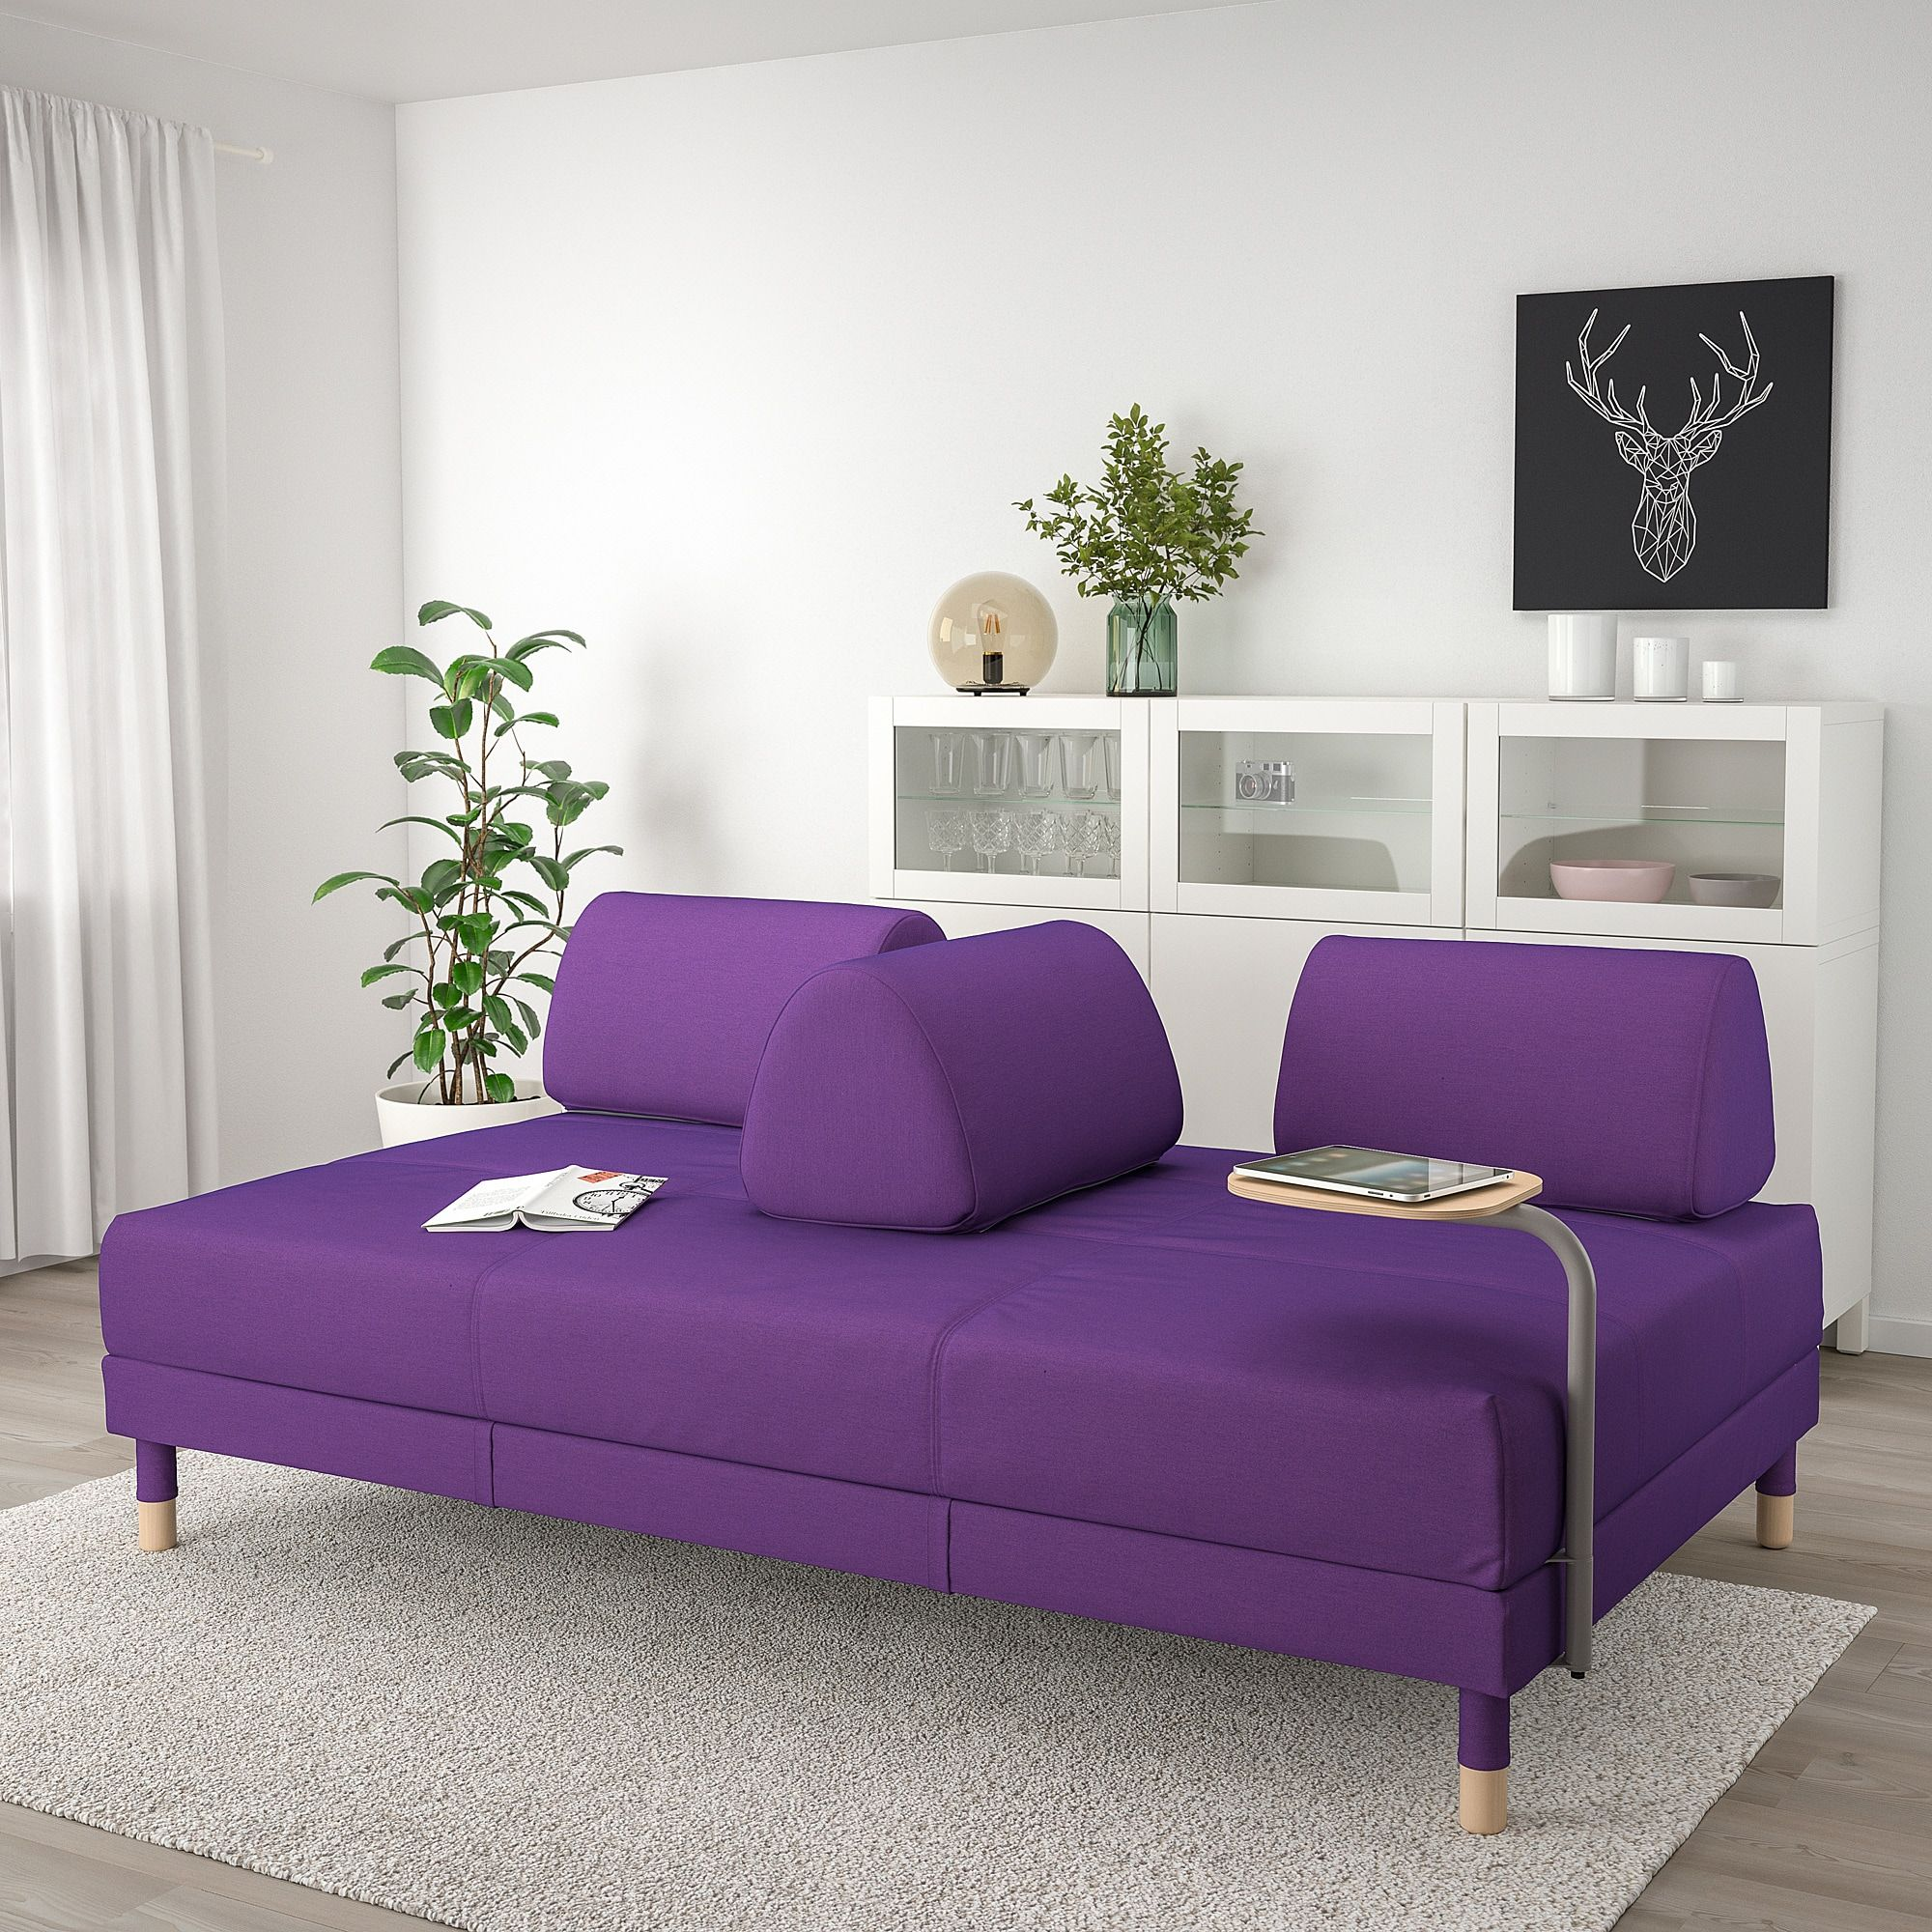 Flottebo Sleeper Sofa With Side Table Vissle Purple 47 1 4 120 Cm Sleeper Sofa Sofa Sleeper Sofa Mattress